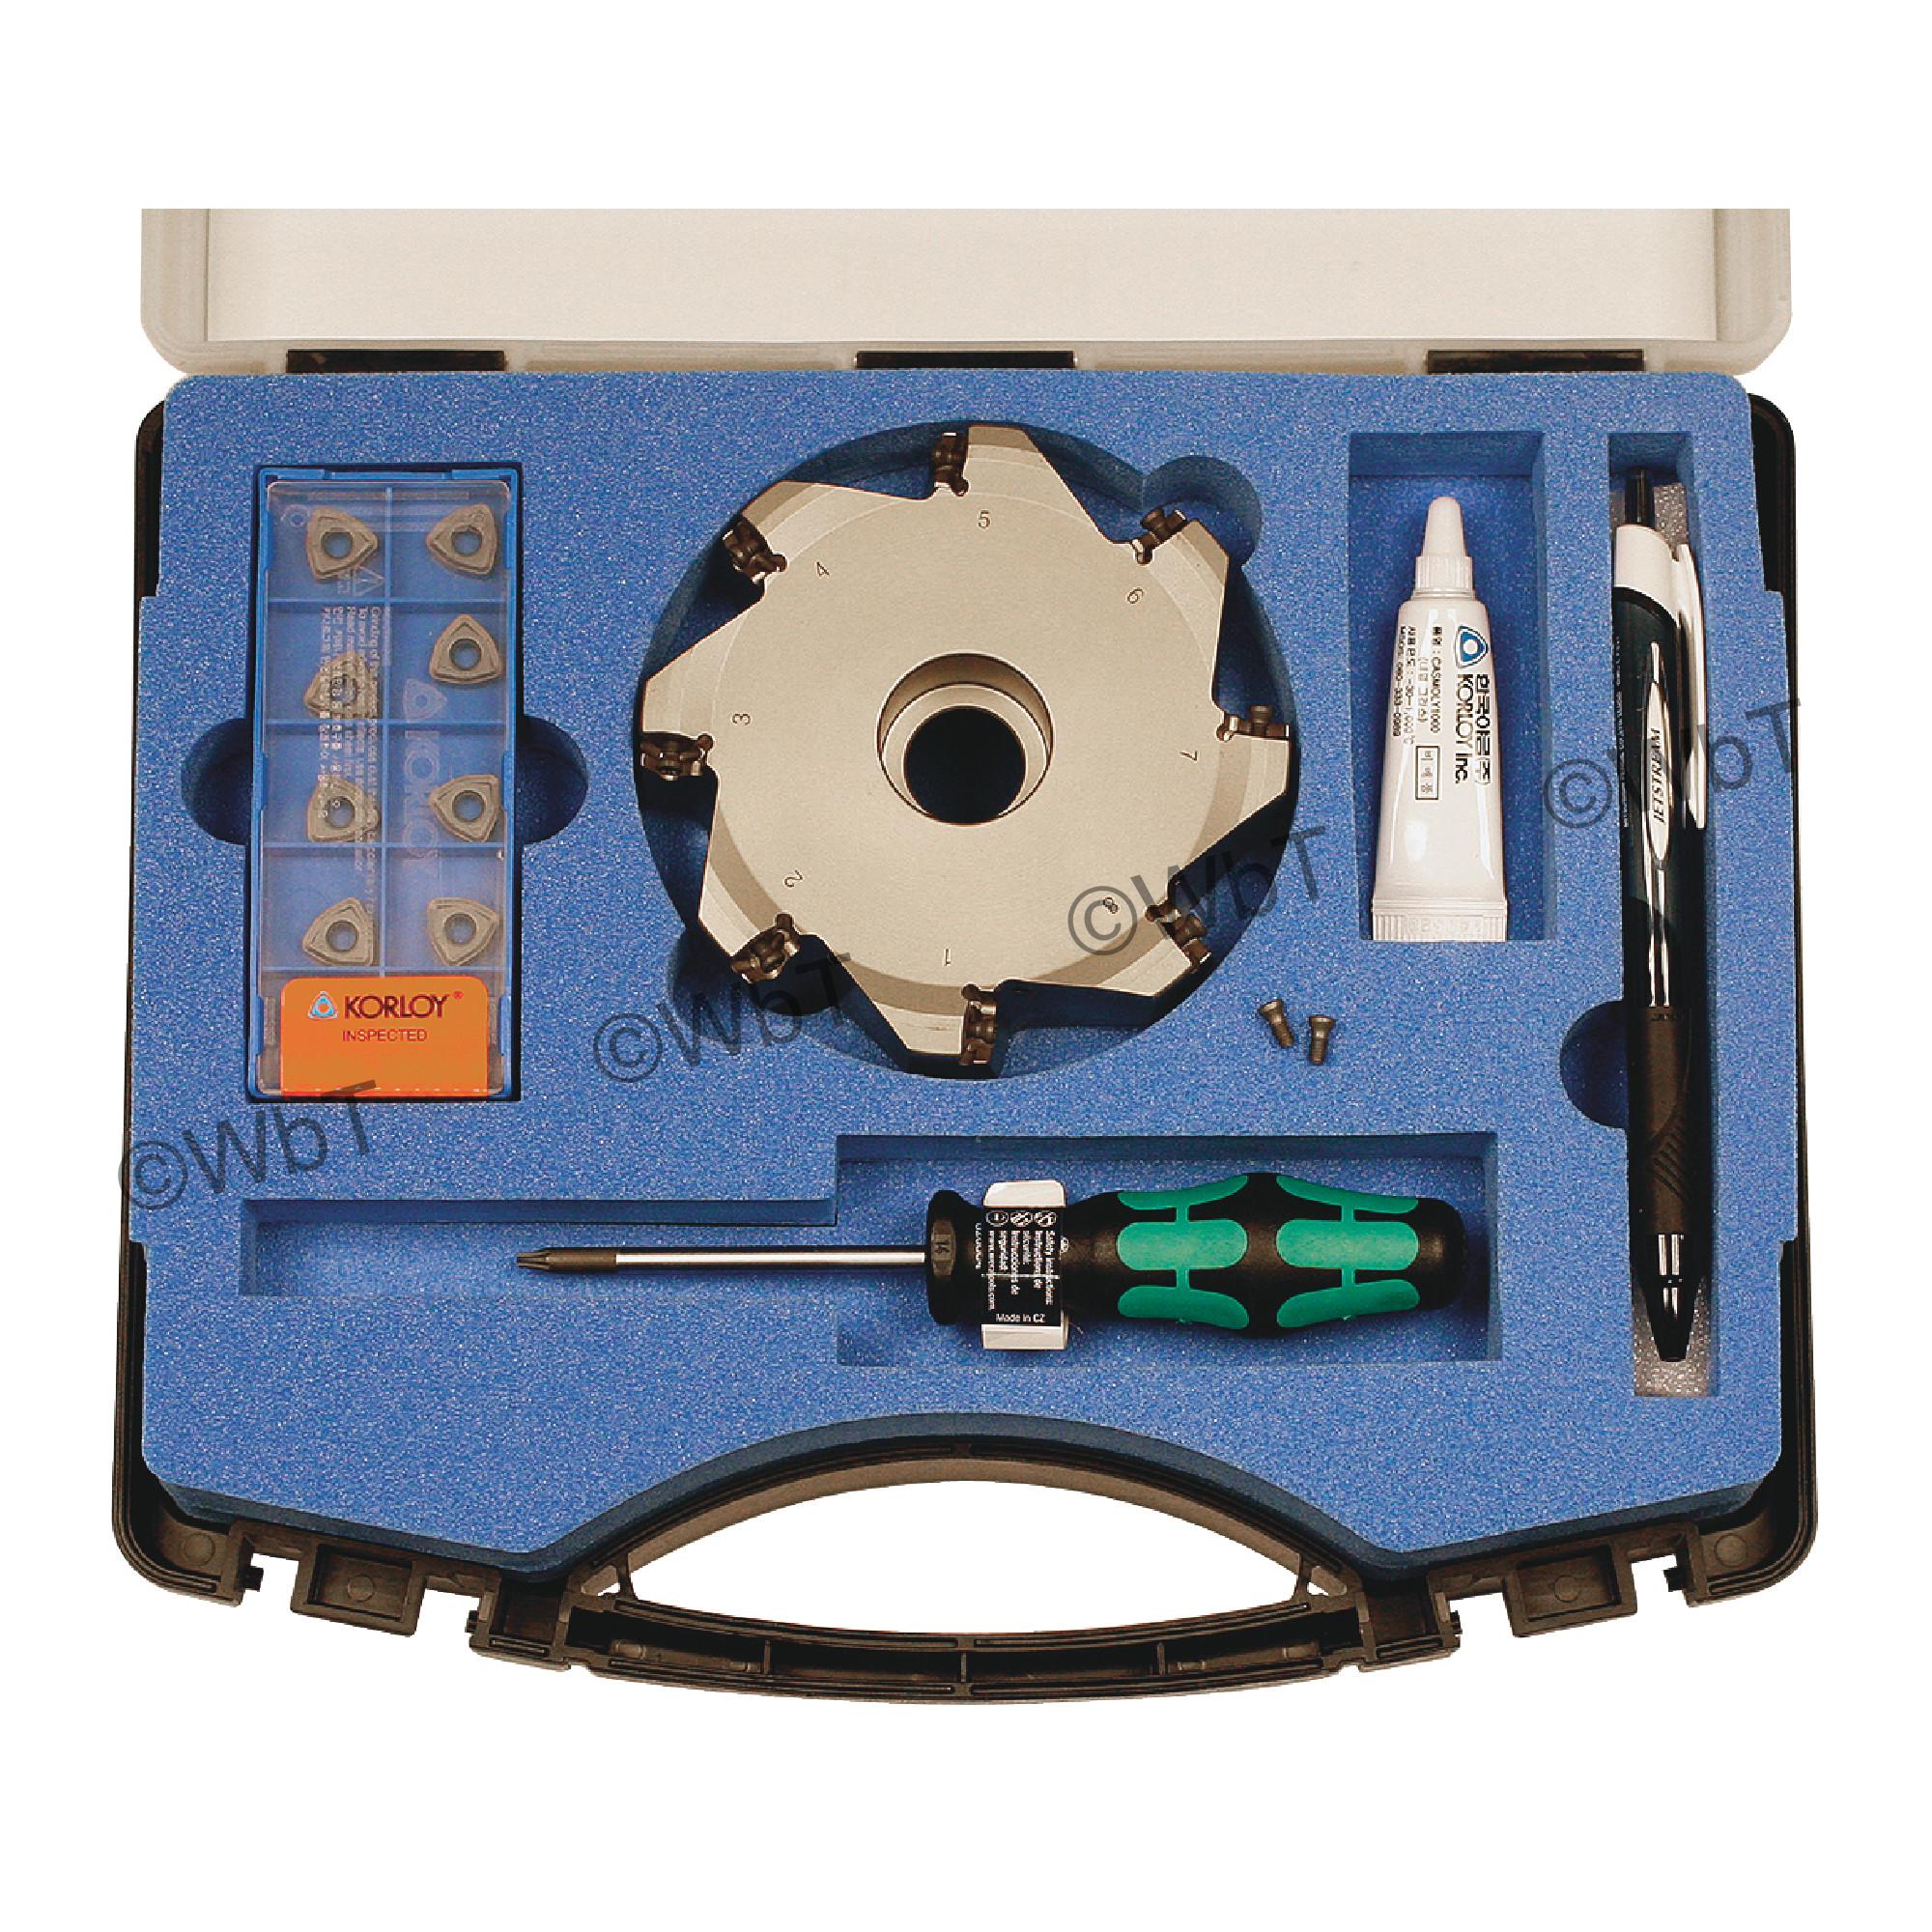 "KORLOY - 4.000"" High-Feed Face Mill Set / Includes: (1) HRMDCA09400HR-8 (4.0"" ø) & (10) WNMX09T316ZNN-MM PC5300 C"